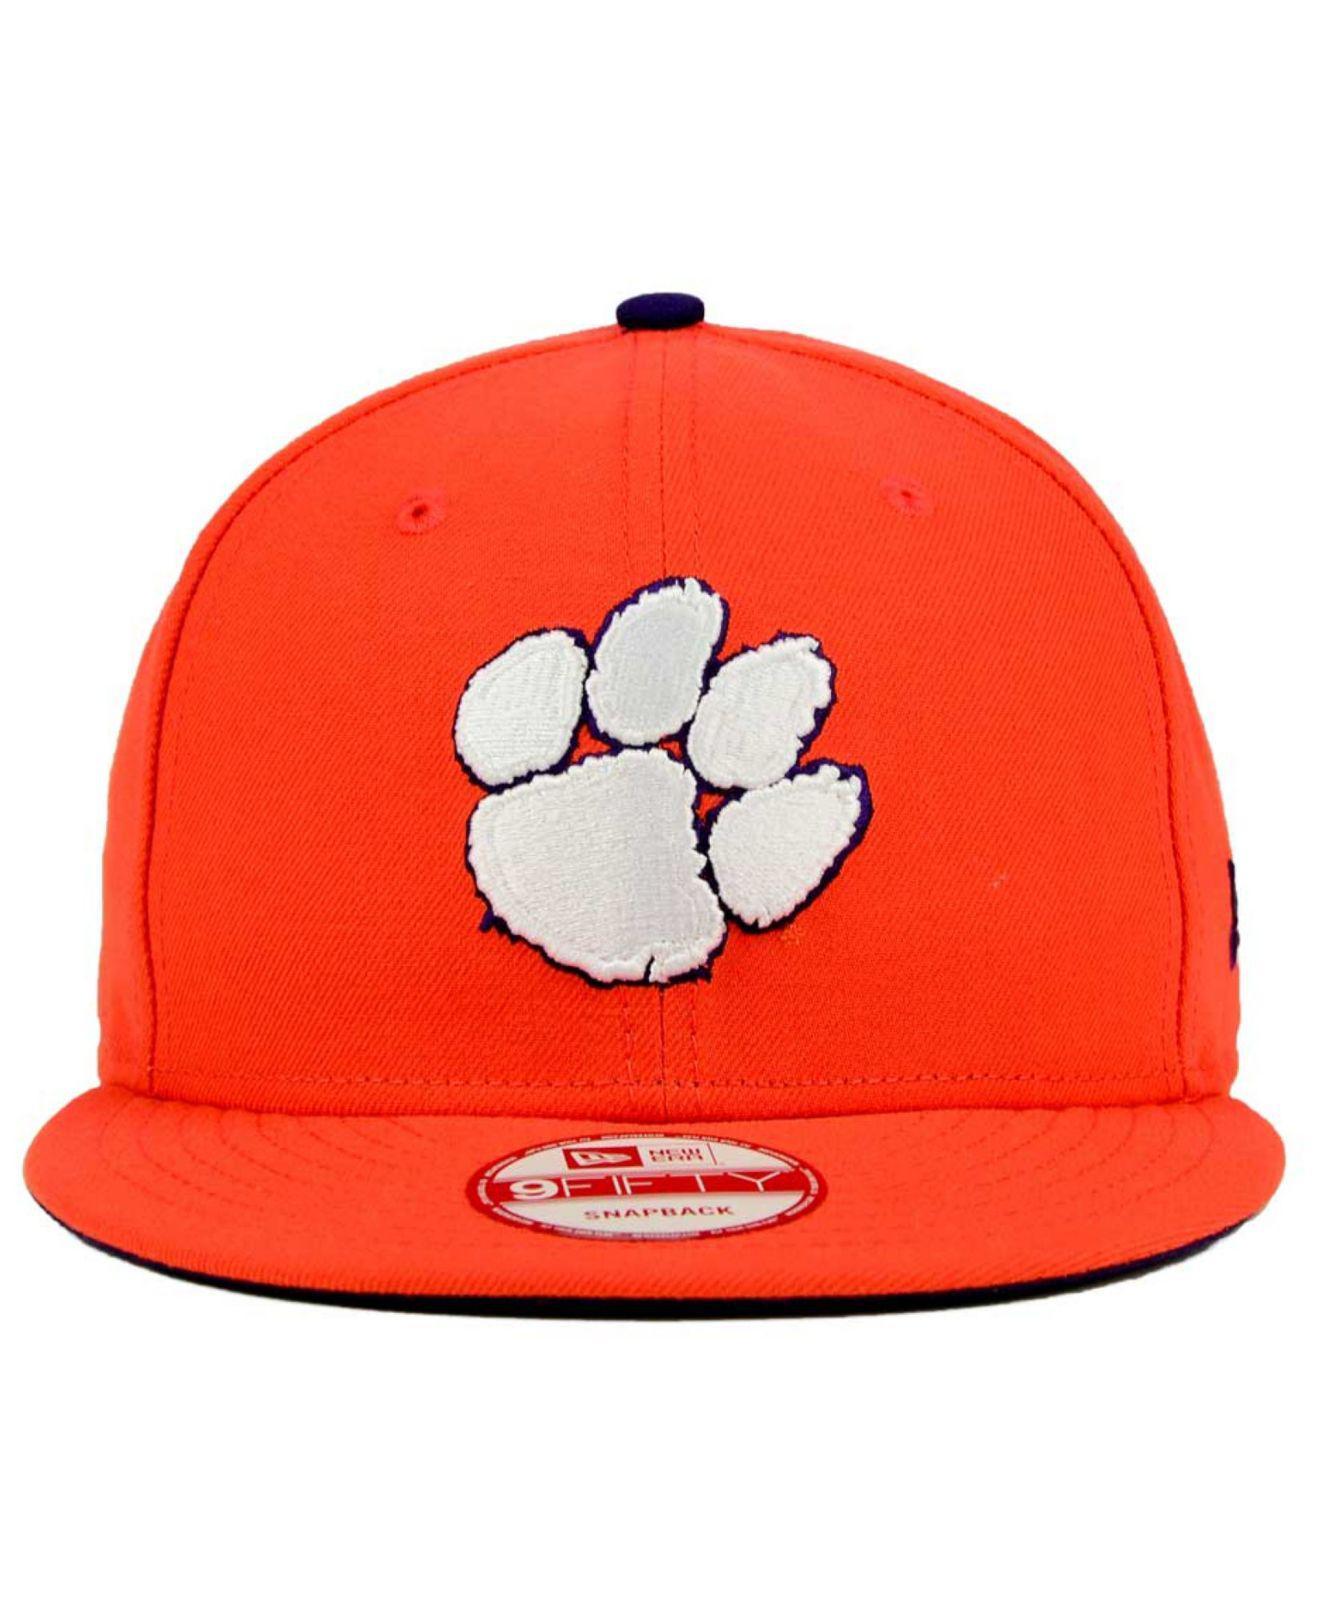 cca6086eb1a Lyst - KTZ Clemson Tigers Core 9fifty Snapback Cap in Orange for Men